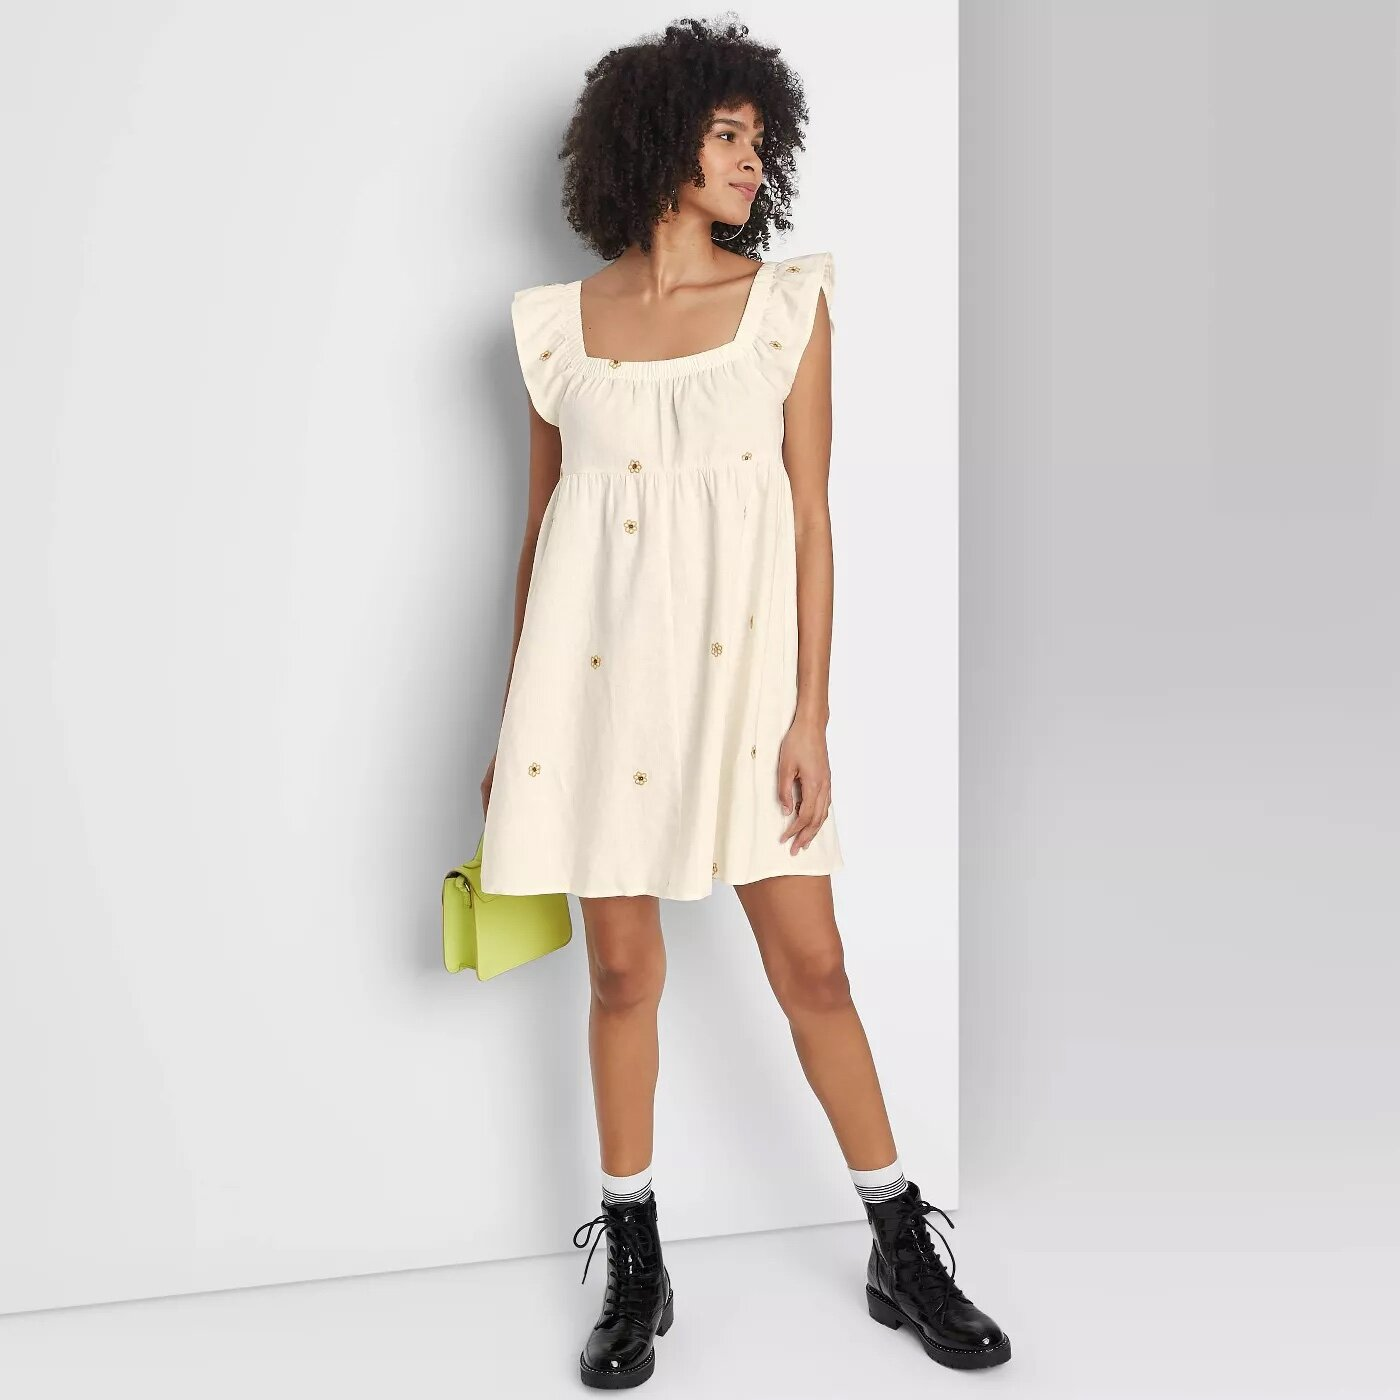 target-babydoll-dress.jpg